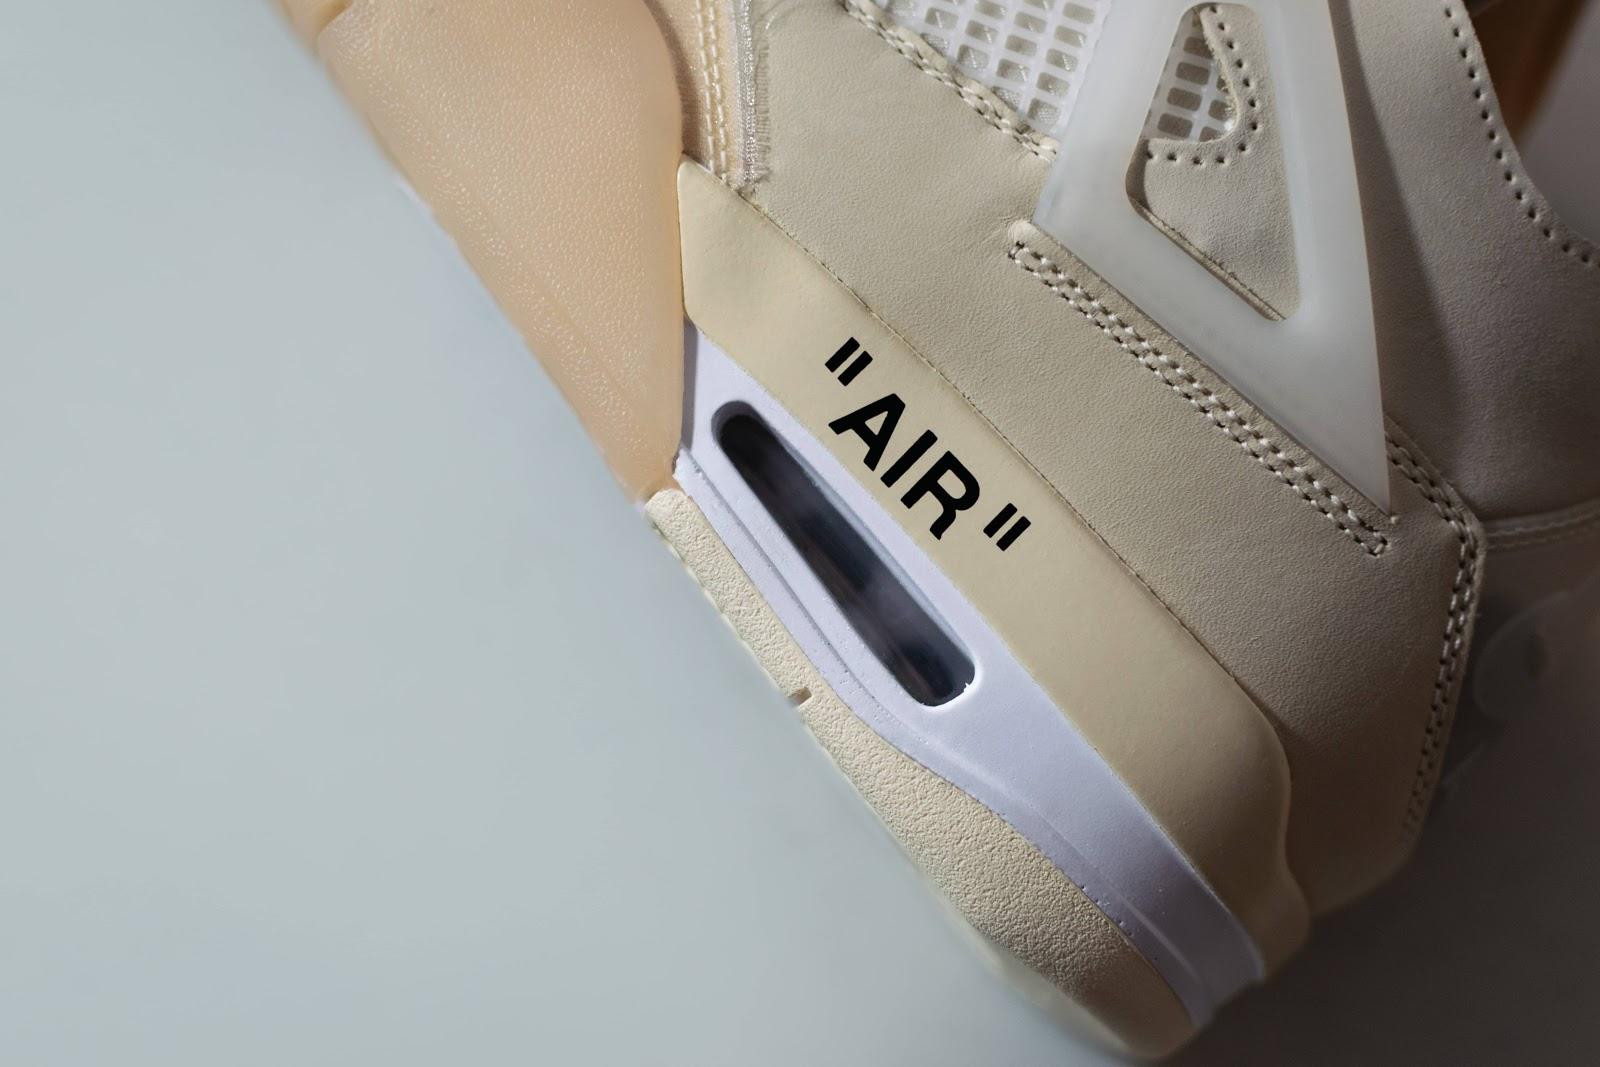 air-jordan-scarpe-rosa-buoni-sconto-bstn